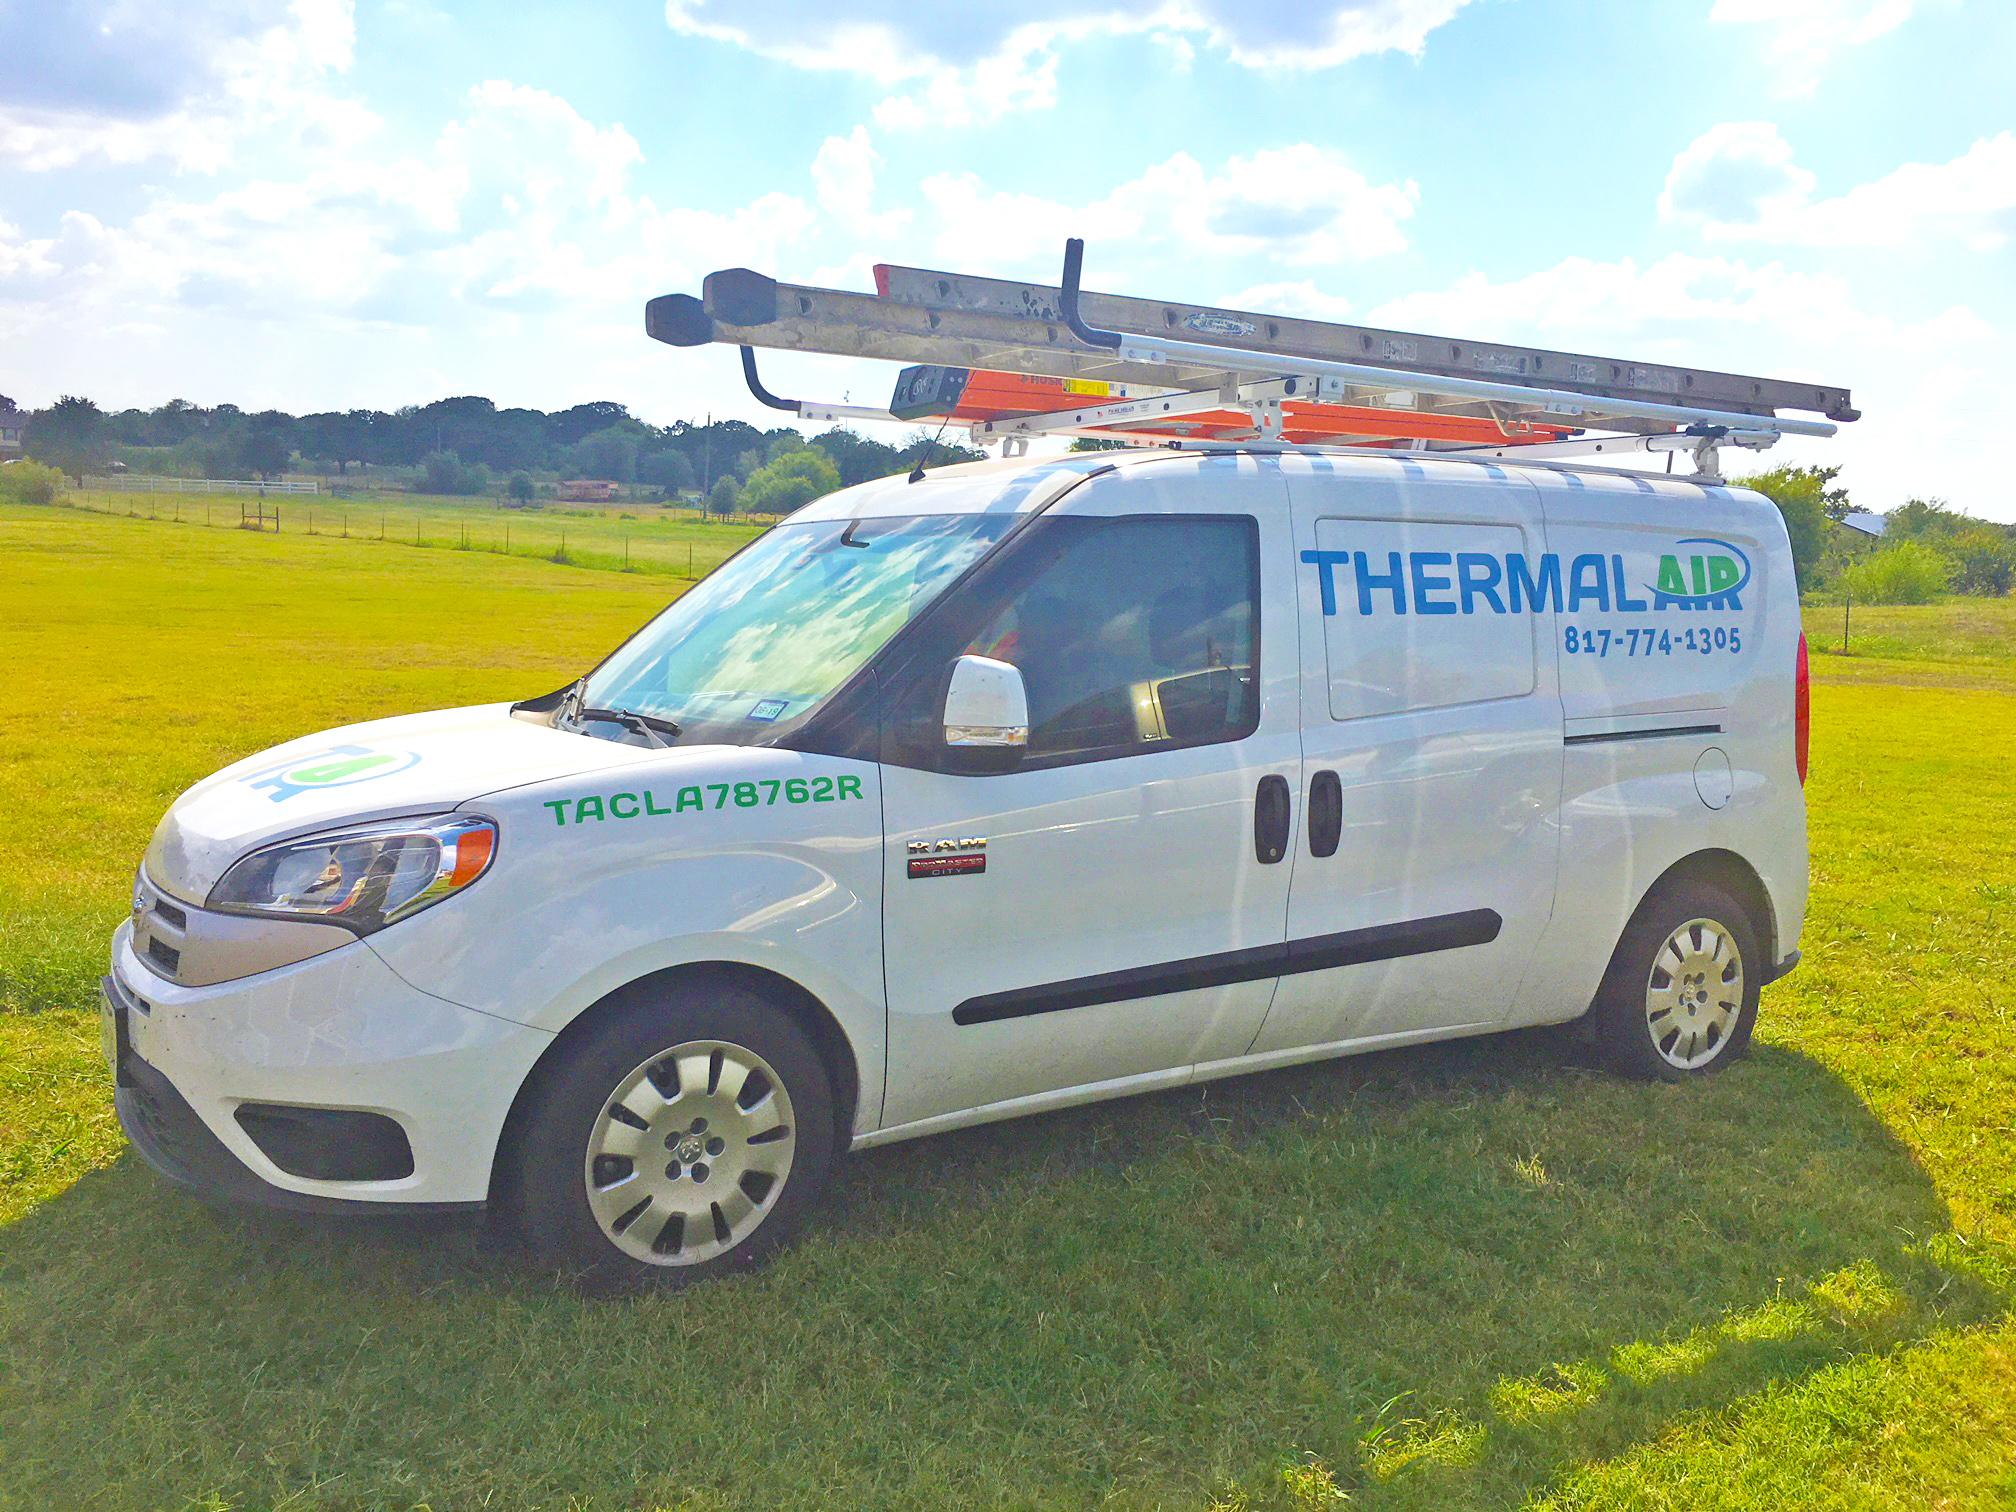 Thermal Air Work Van